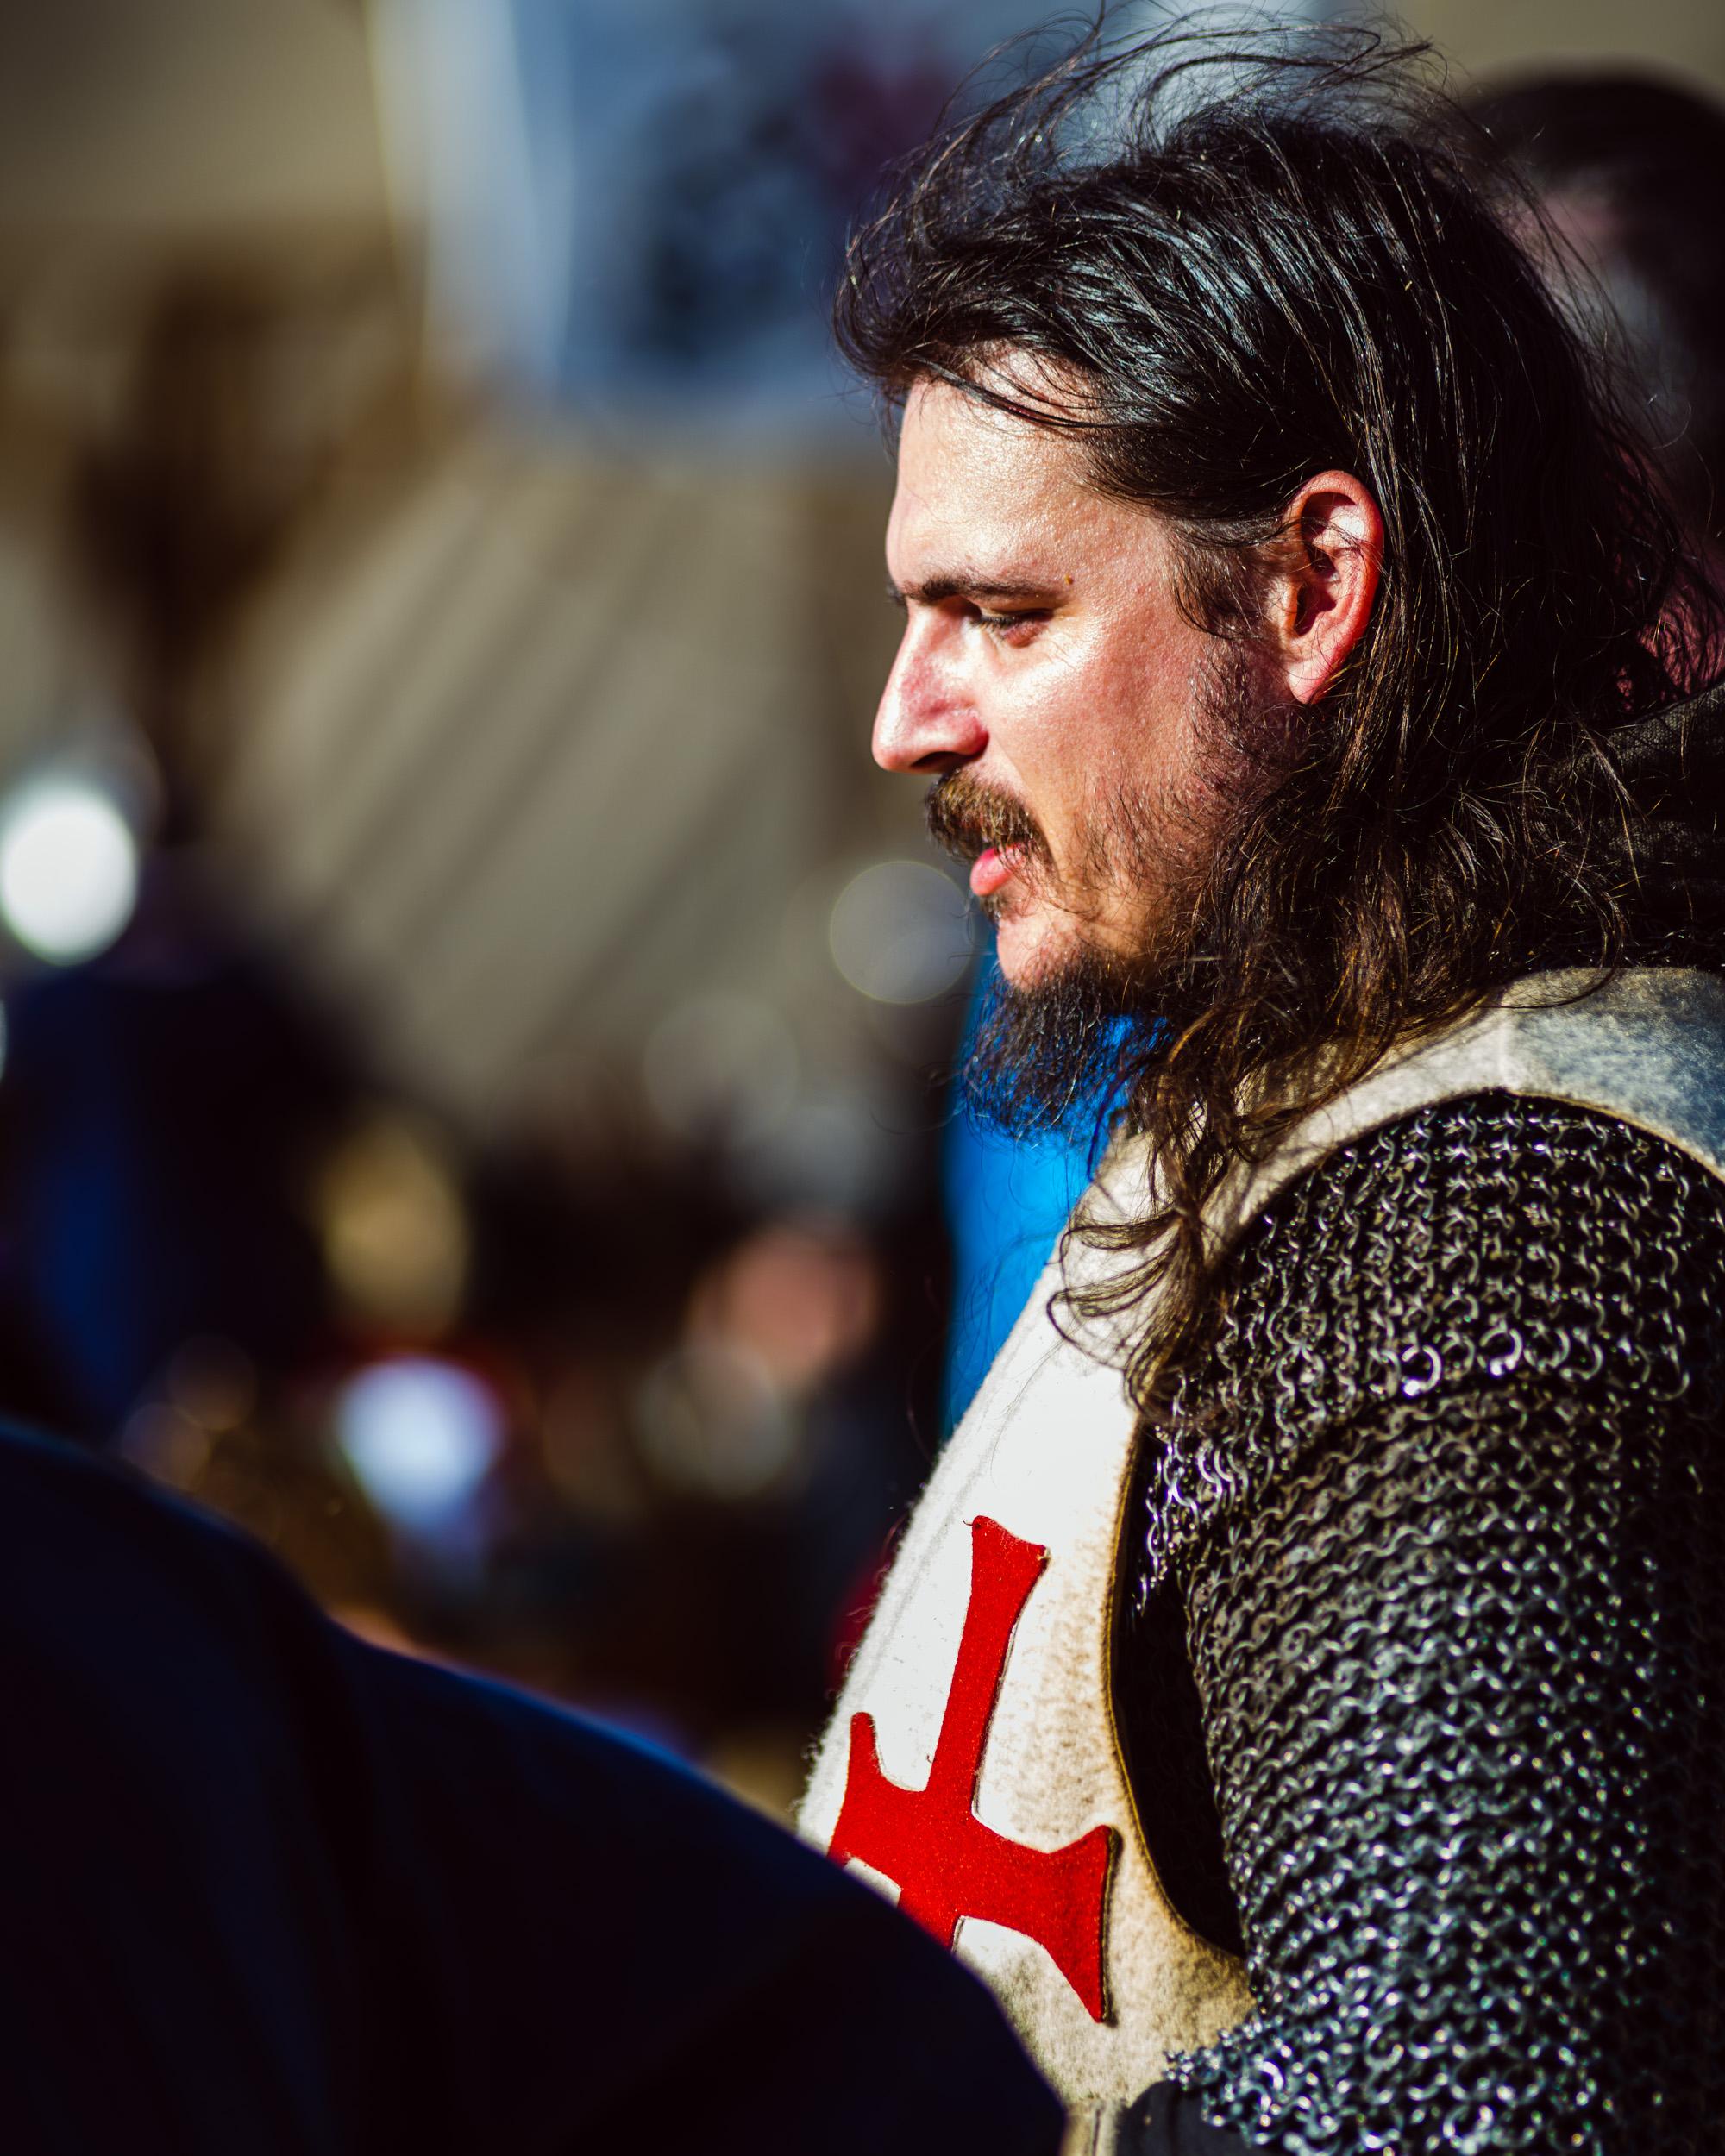 Spyrides_Kyle_Soul.Gazing.Photography_Medieval.Day_Reenactment.Group.Einherjar_Danelaw.Medieval.Fighting.Society_Petersham.Bowling.Club_18.8.2019DSC_0516.jpg